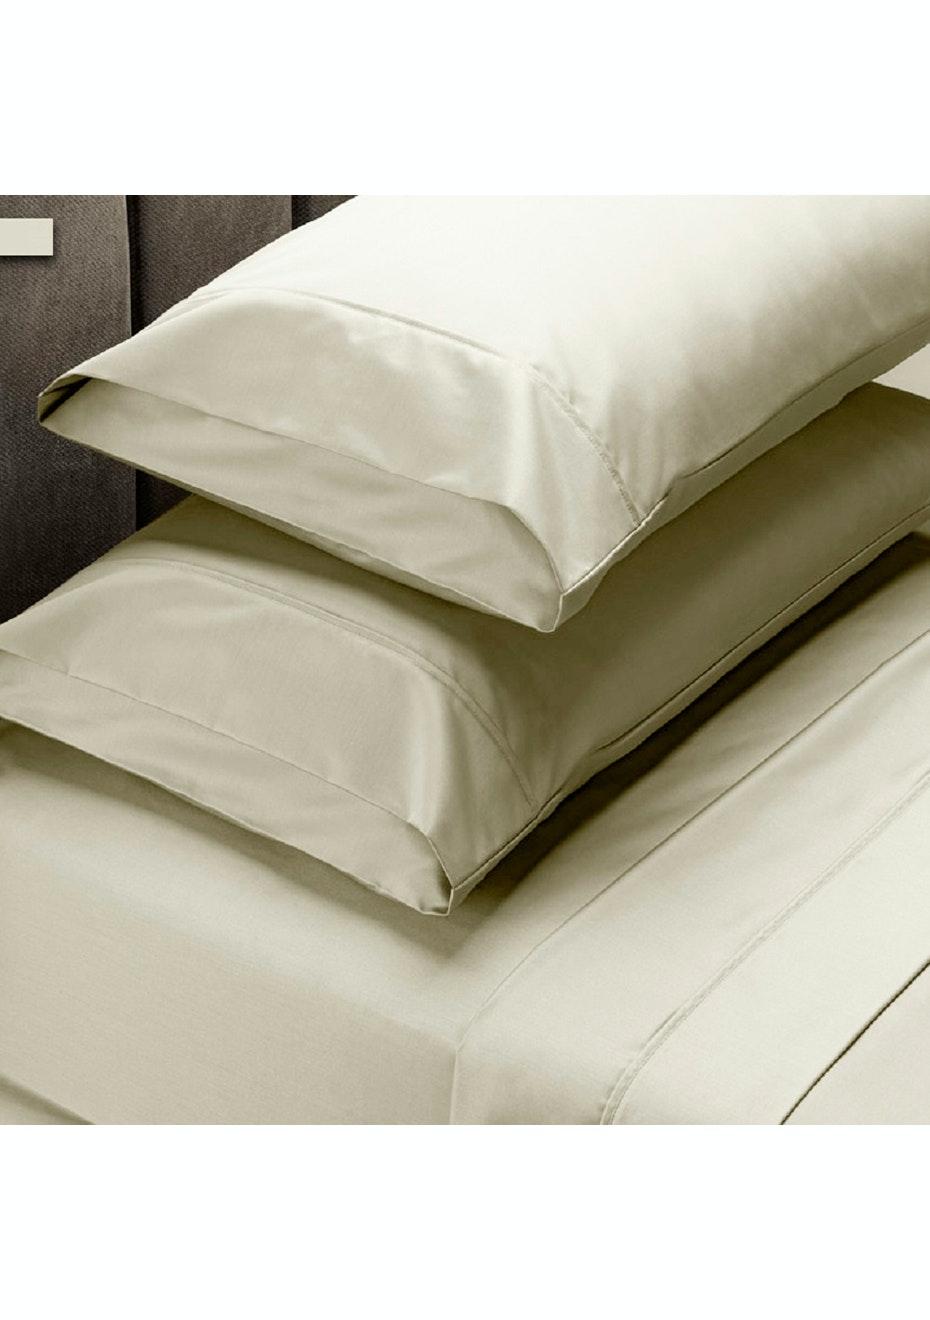 Park Avenue 1000 Thread Count 100% Egyptian Cotton Sheet Sets King - Birch